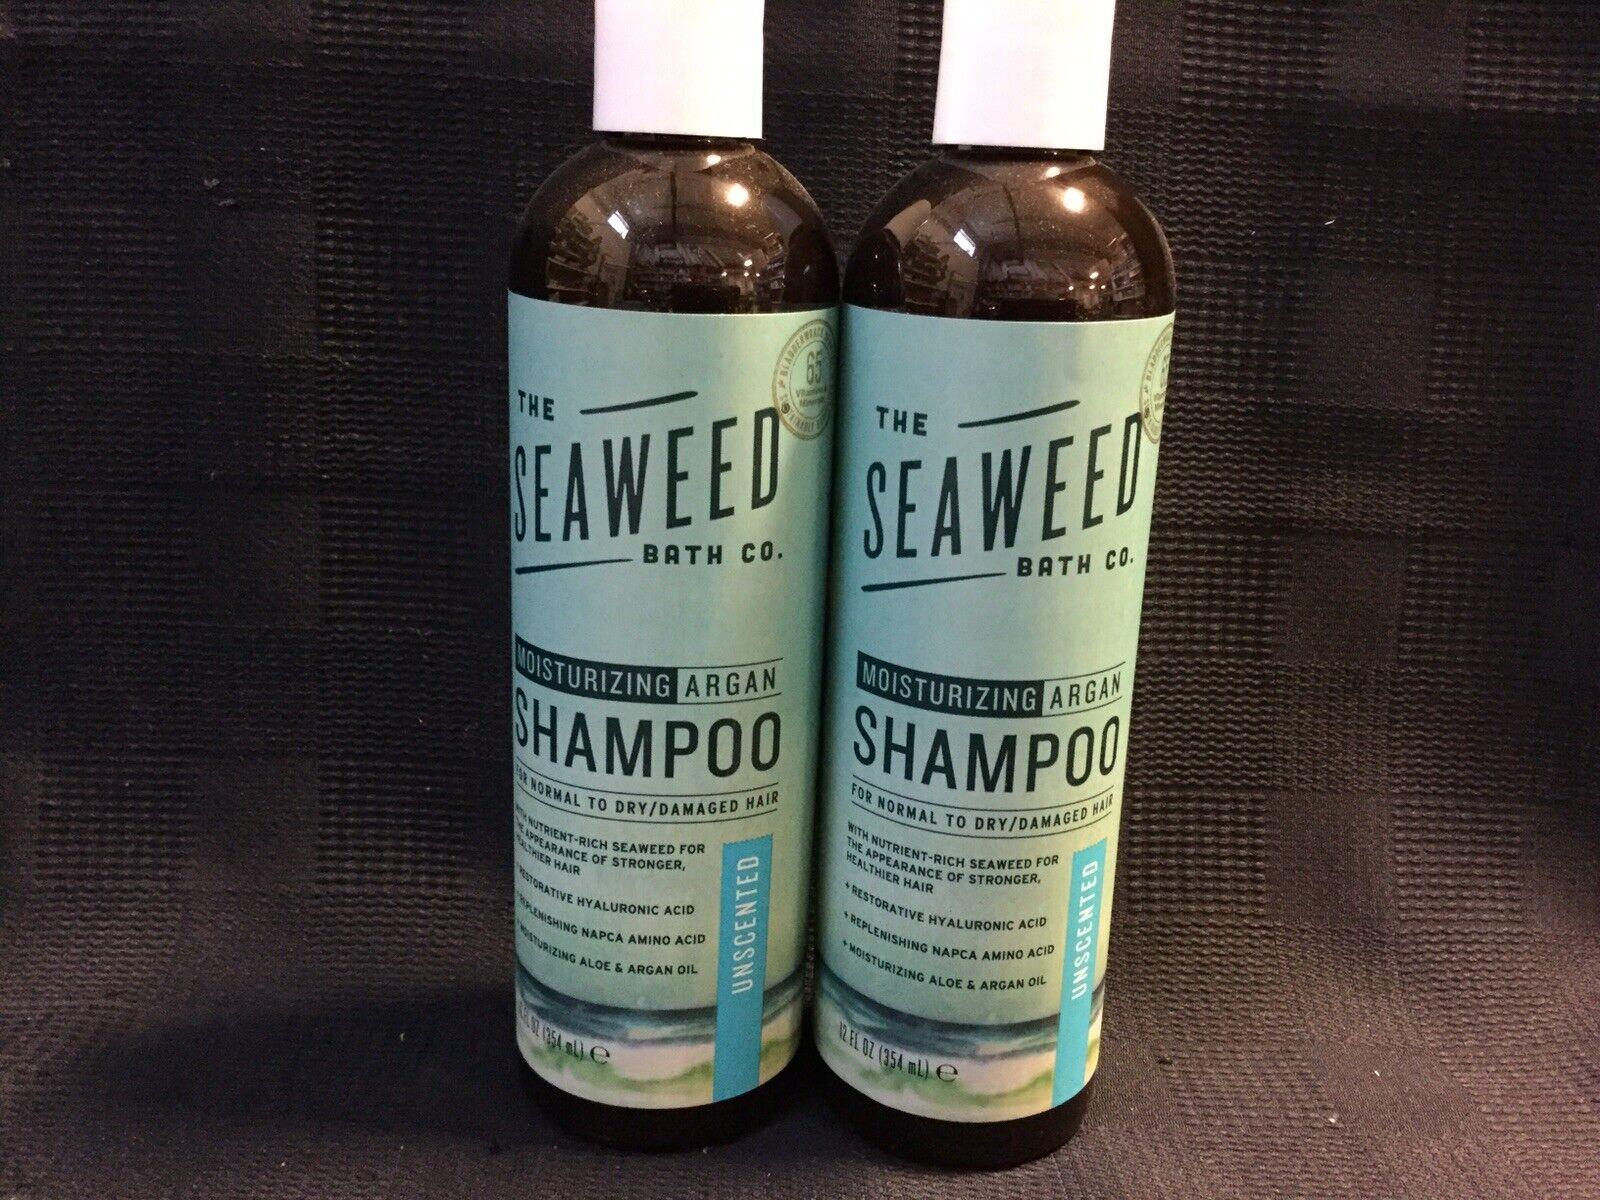 2 Pack The Seaweed Bath Co Shampoo Moisturizing Unscented 12 Fl Oz Ea 4e For Sale Online